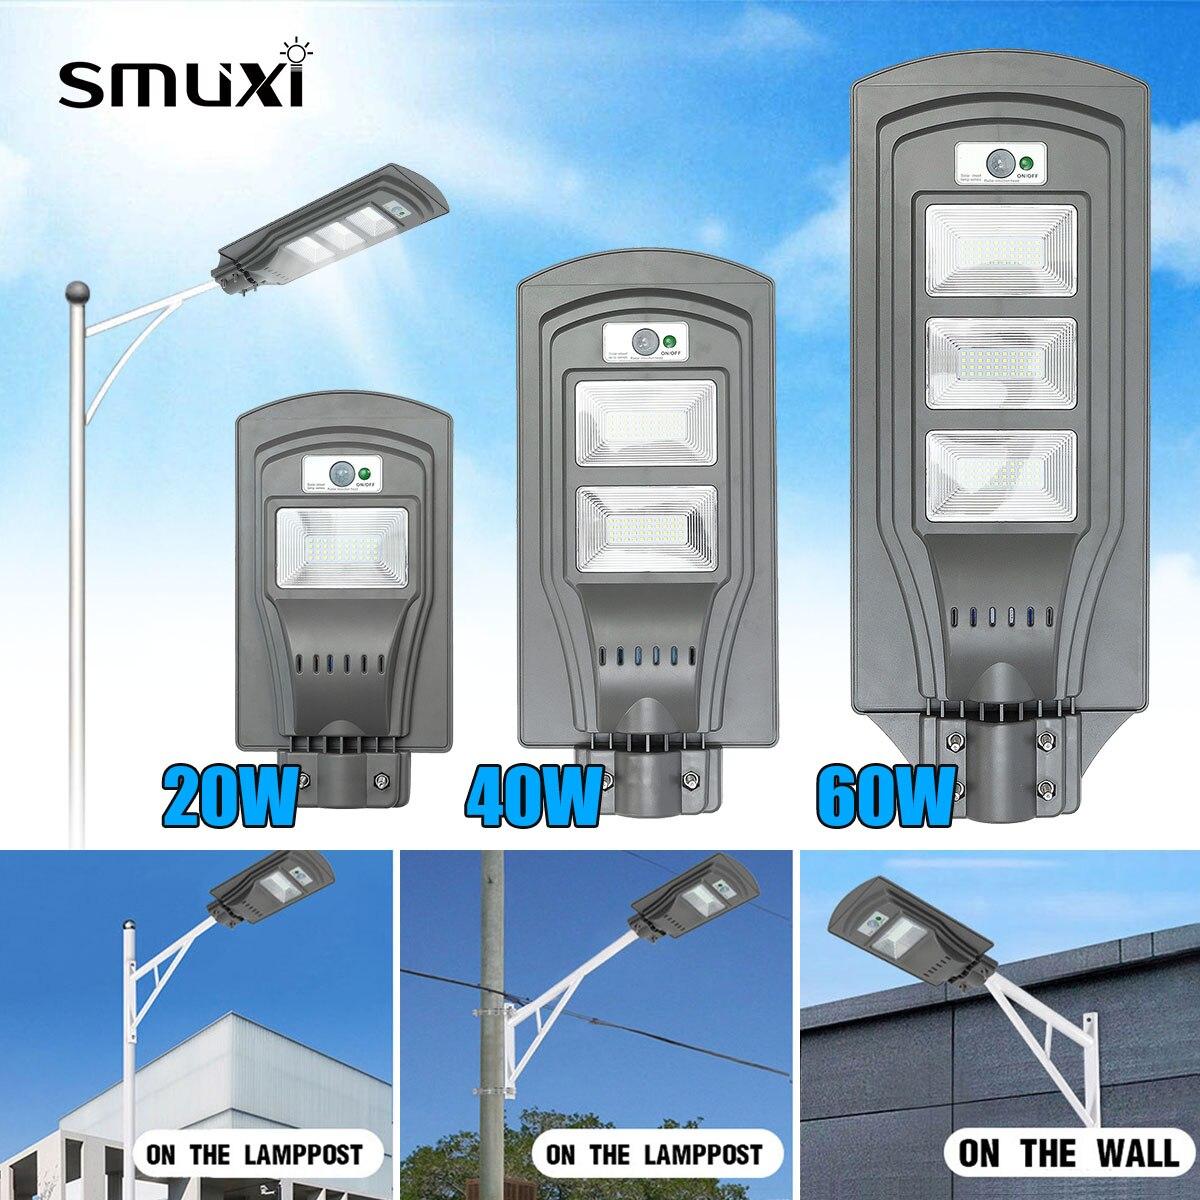 LED Solar Street Light LED Wall Lamp 20W/40W/60W Motion Sensor Waterproof Security Lamp For Garden Yard уличное освещение